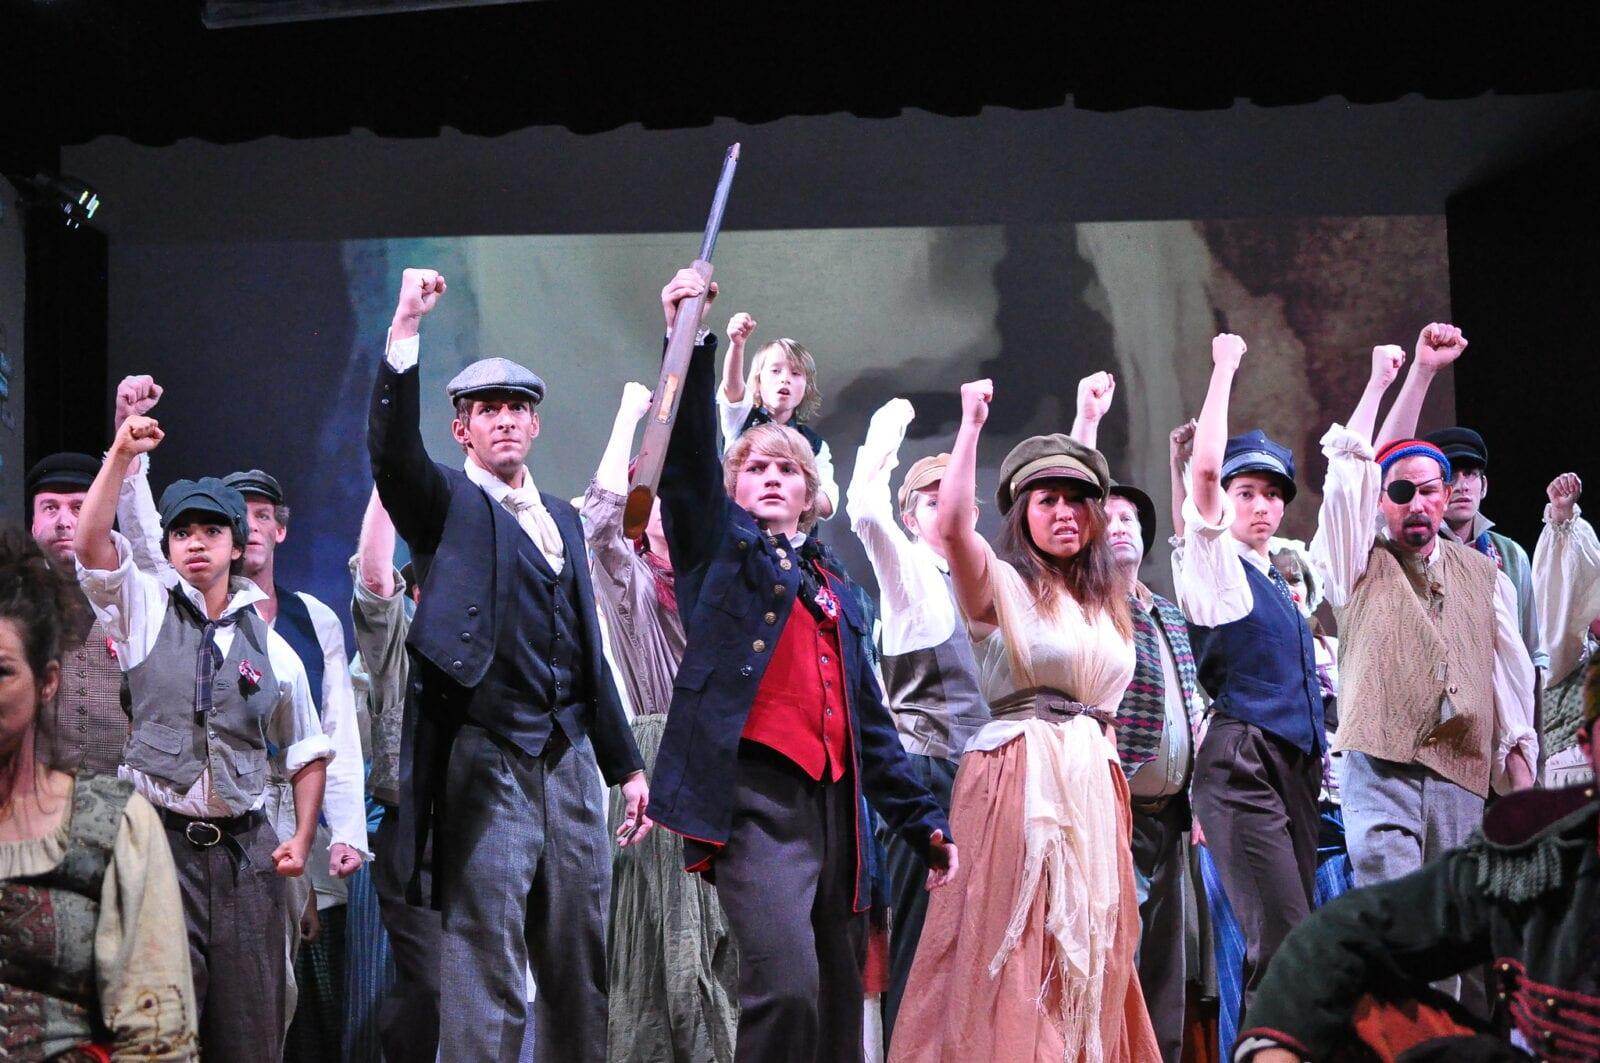 Image of actors performing at the Picketwire Players Community Theatre in La Junta, Colorado